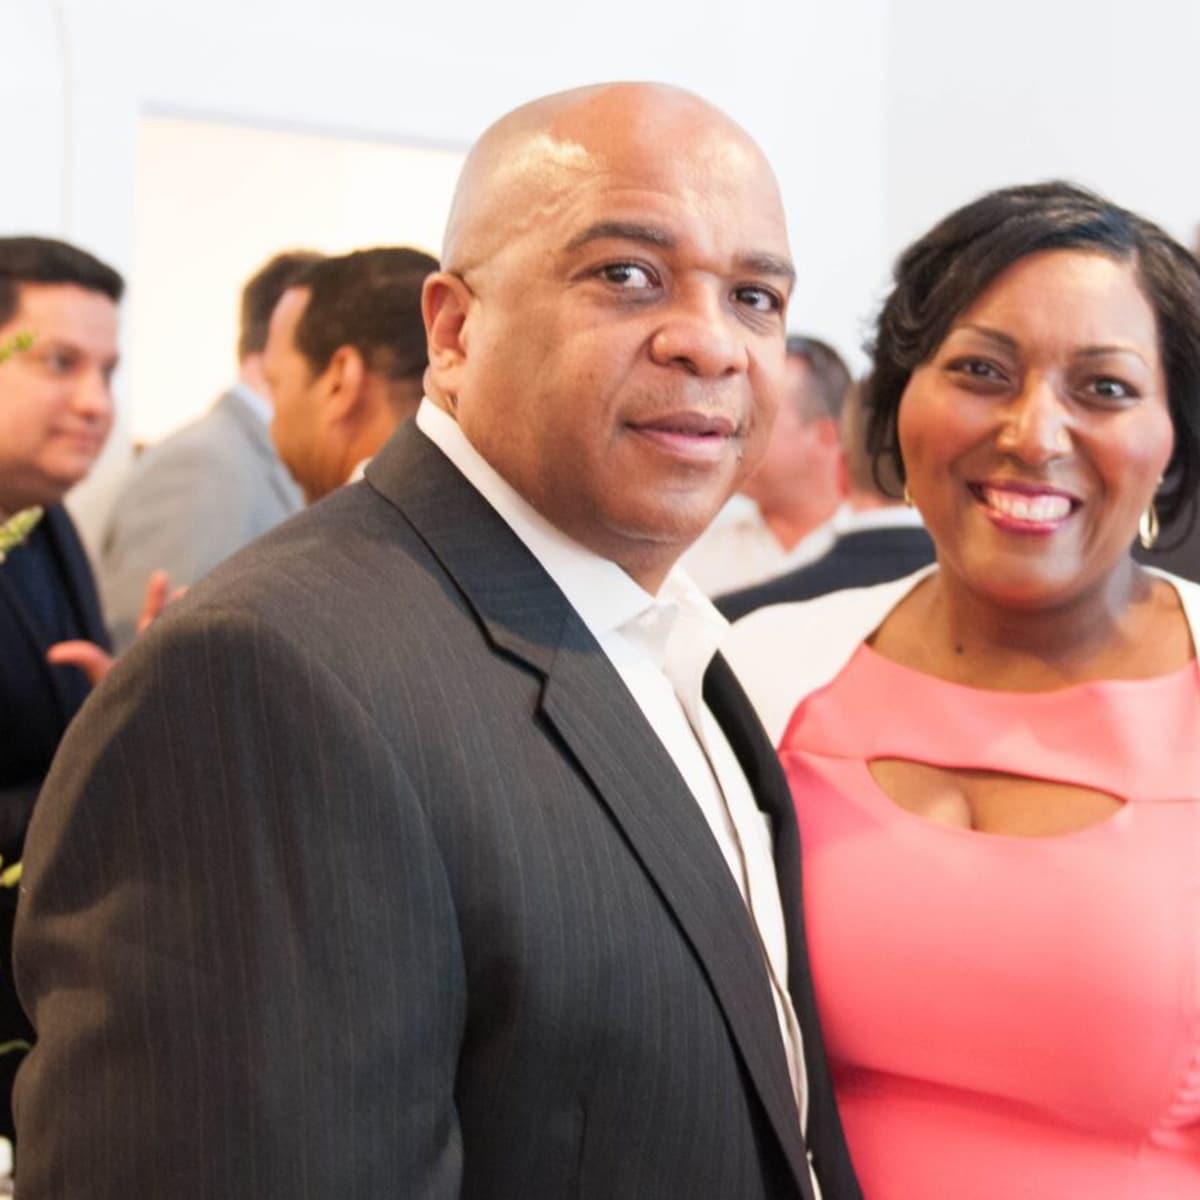 Houston, Engel and Völkers Launch Party, June 2015, Pierre Chatman Sr., Chantera Chatman